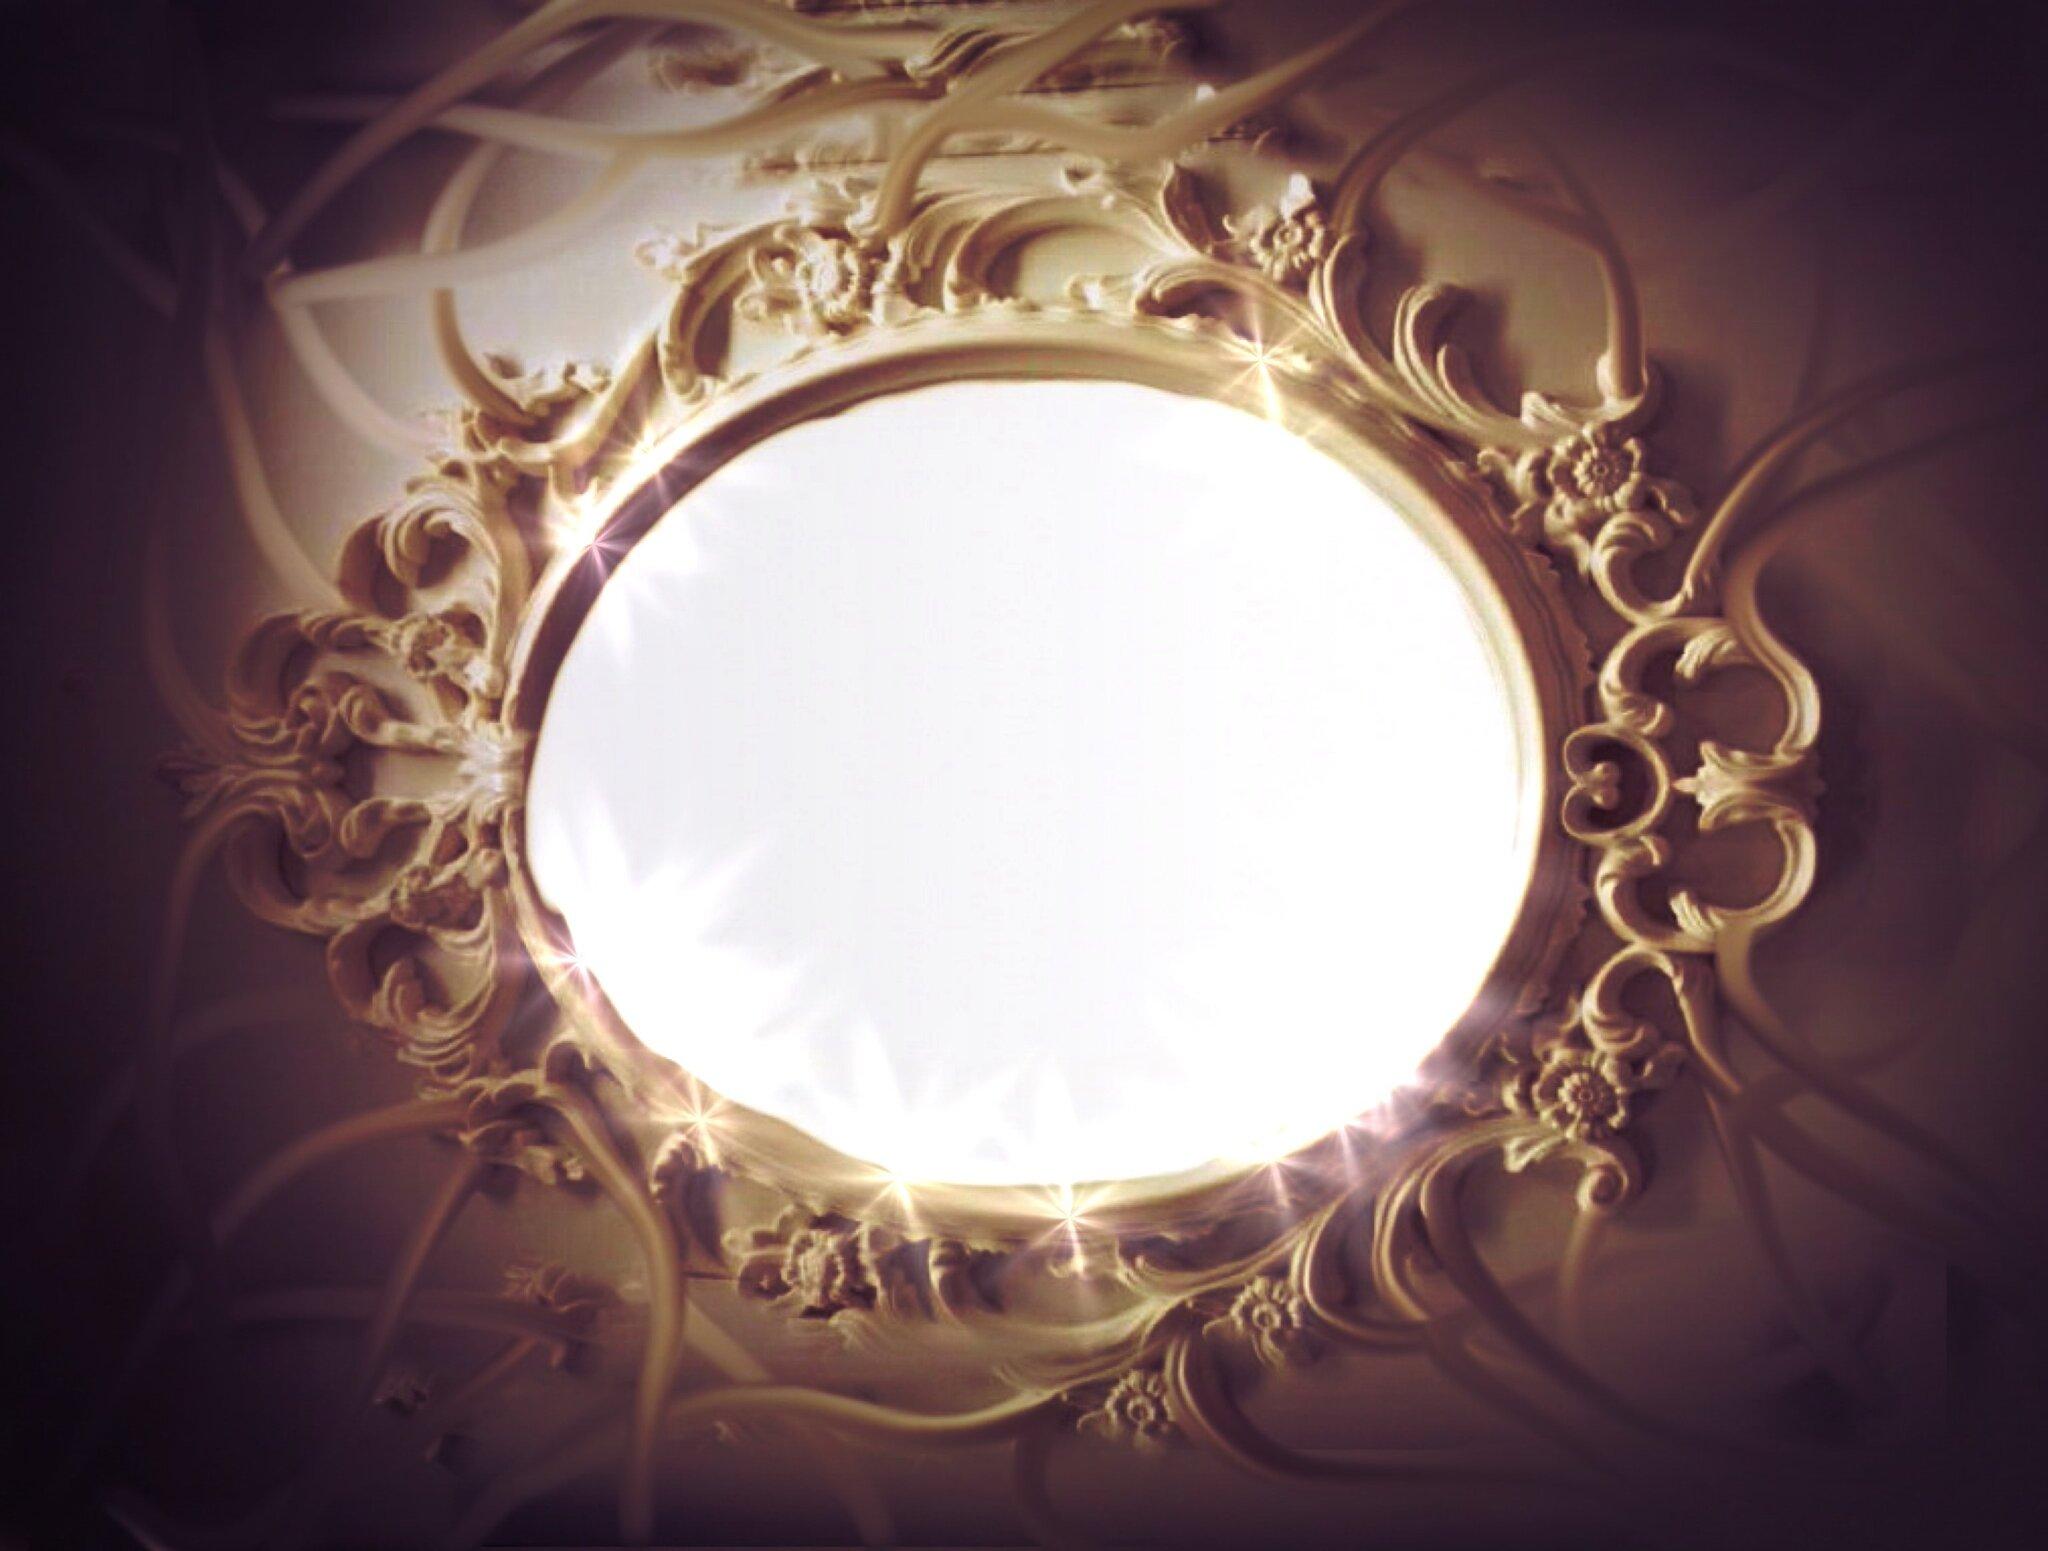 lustro Źródło: pixabay, lustro, licencja: CC 0.